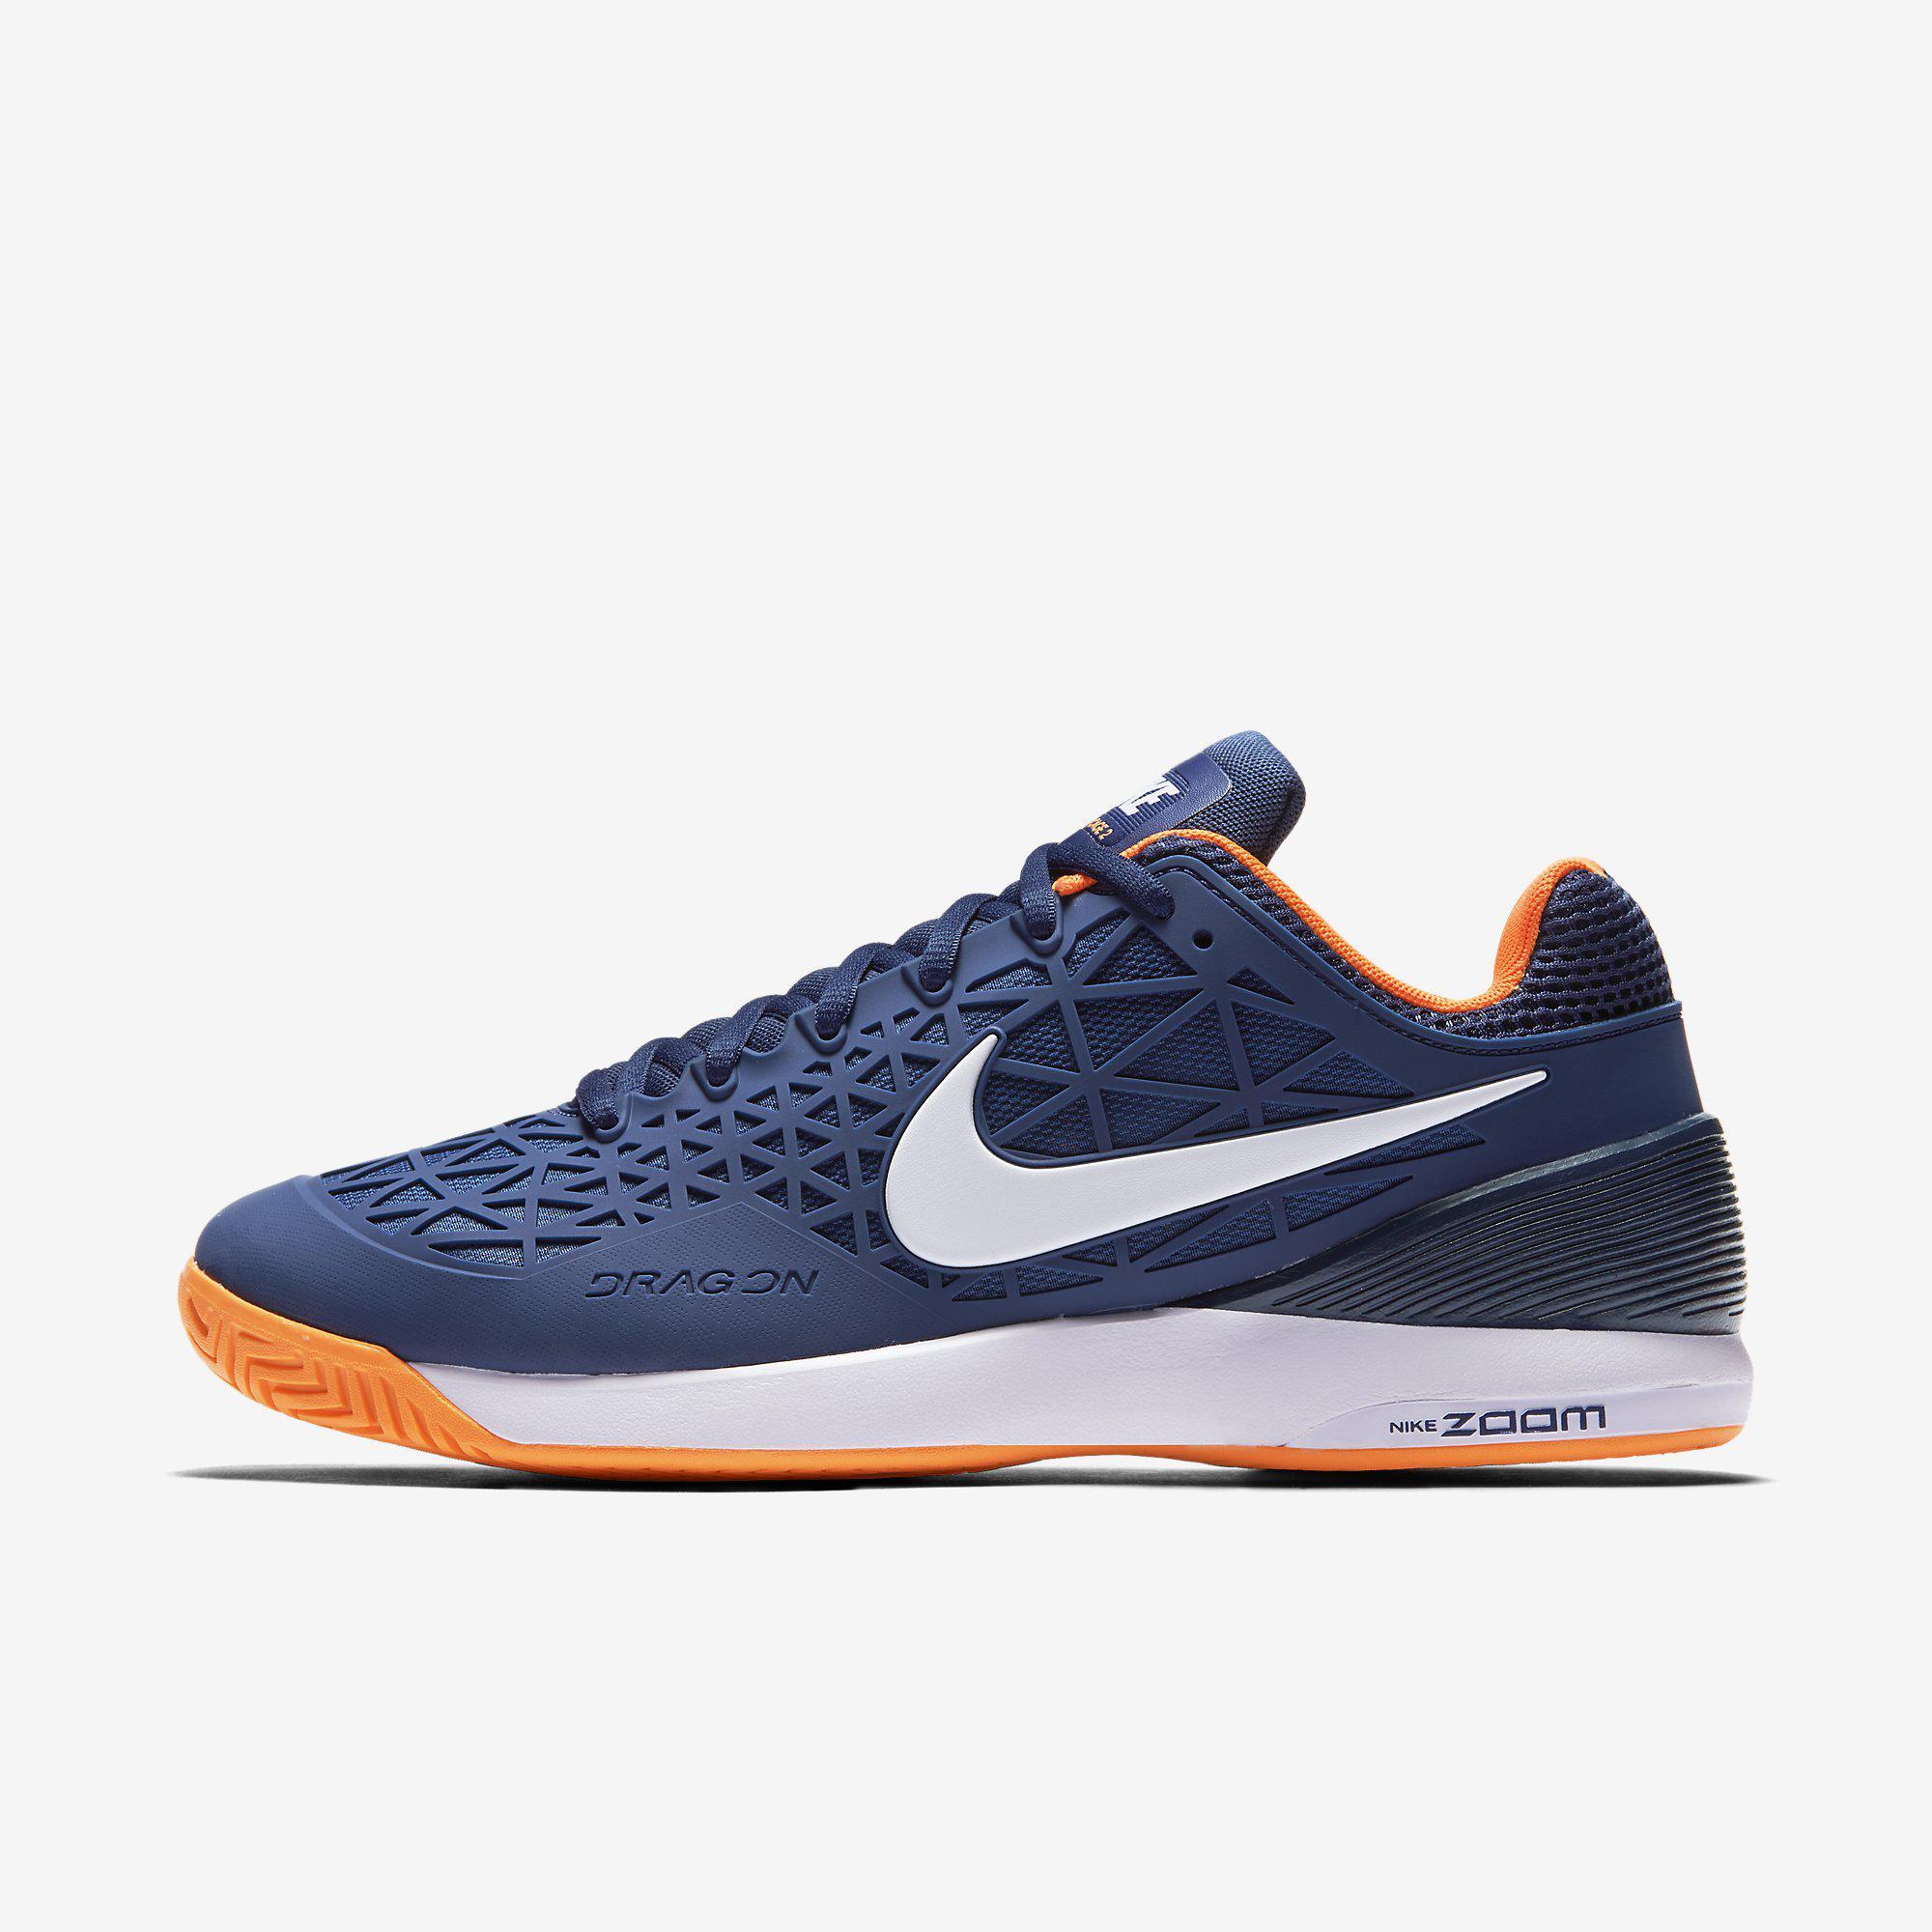 9cede0fc28b48 Nike Mens Zoom Cage 2 Tennis Shoes - Blue Citrus - Tennisnuts.com